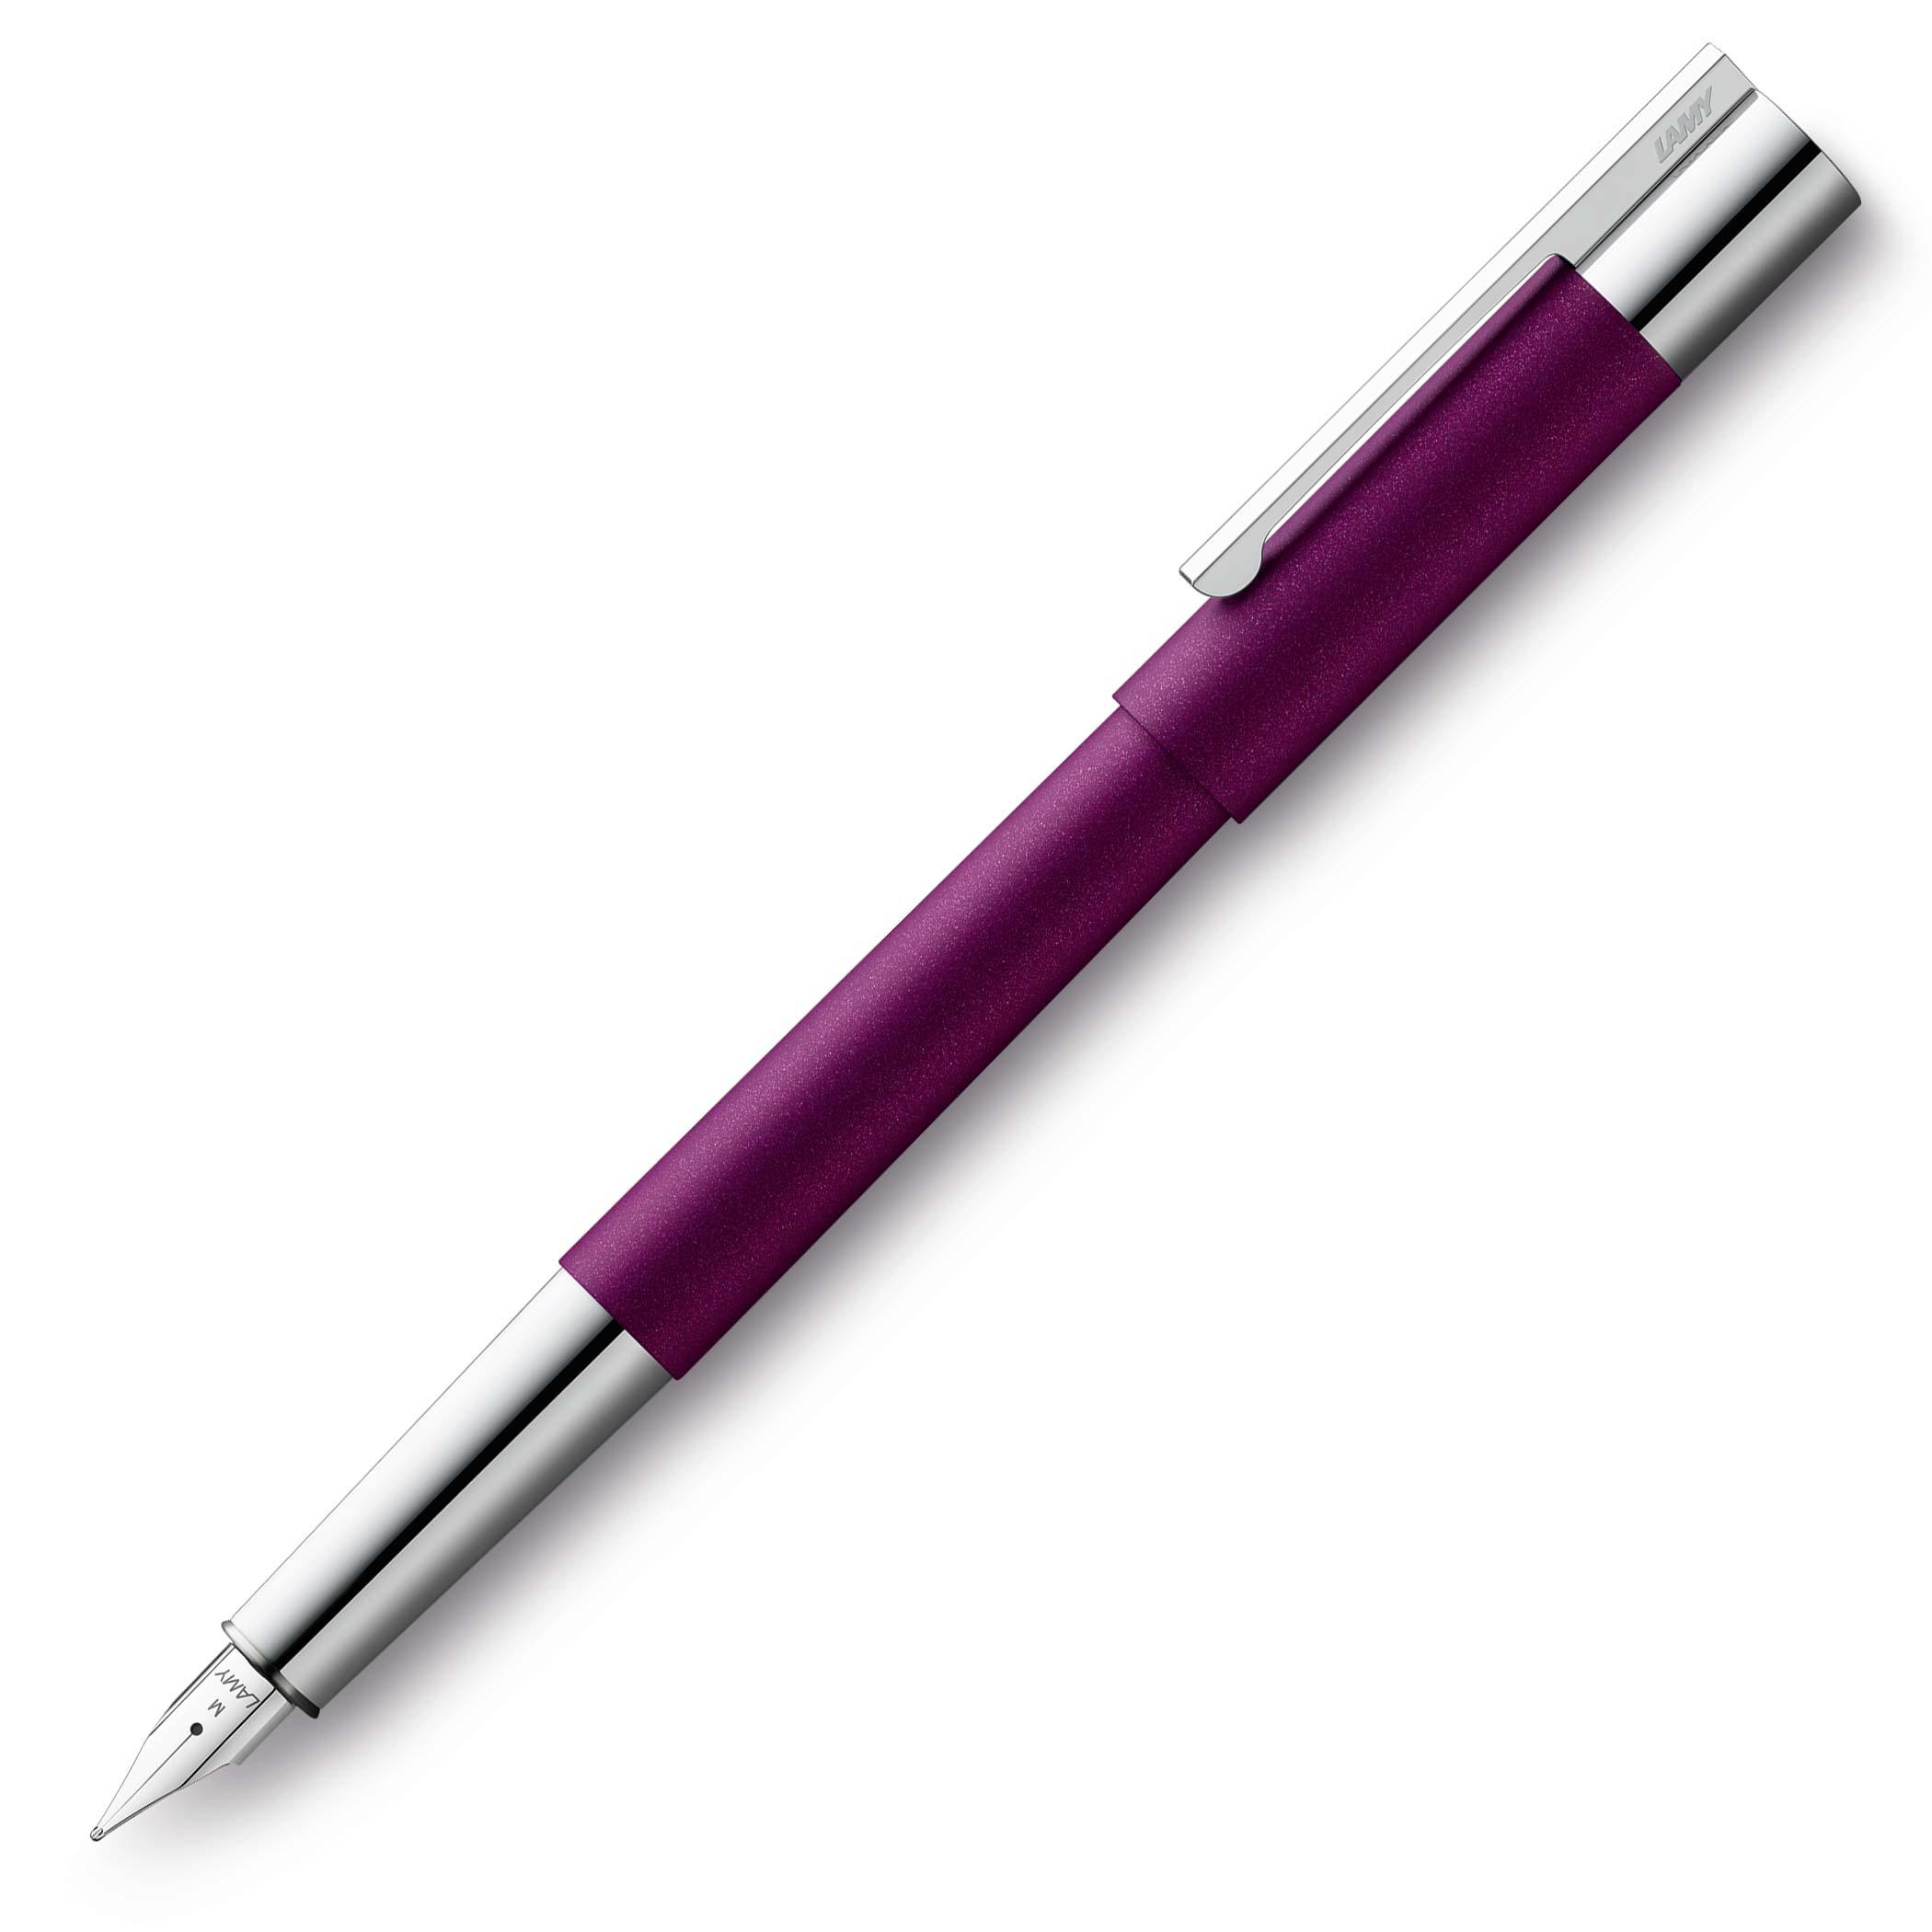 lamy-scala-dark-violet-fountain-pen-nibsmith